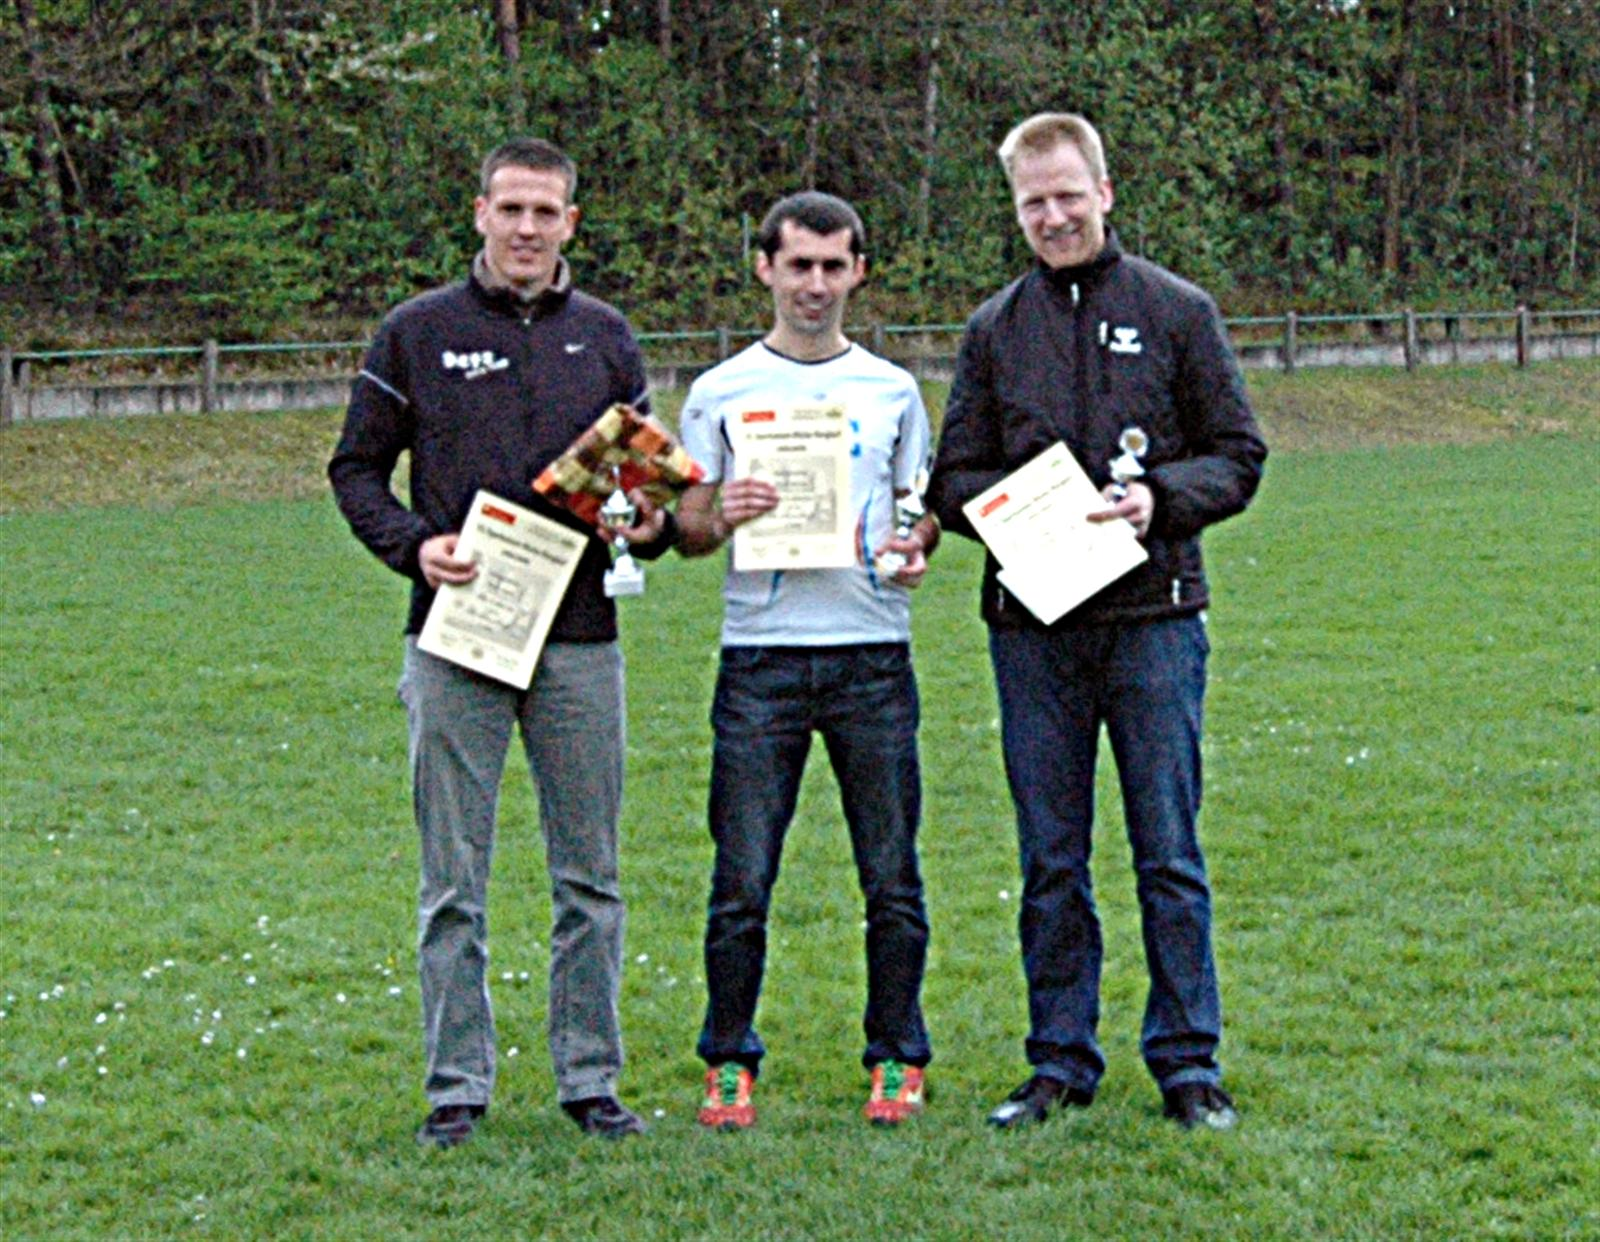 15. Sparkassen Bucke Berglauf 2014 – Stadthagen (Germania) – Un podium de Florii